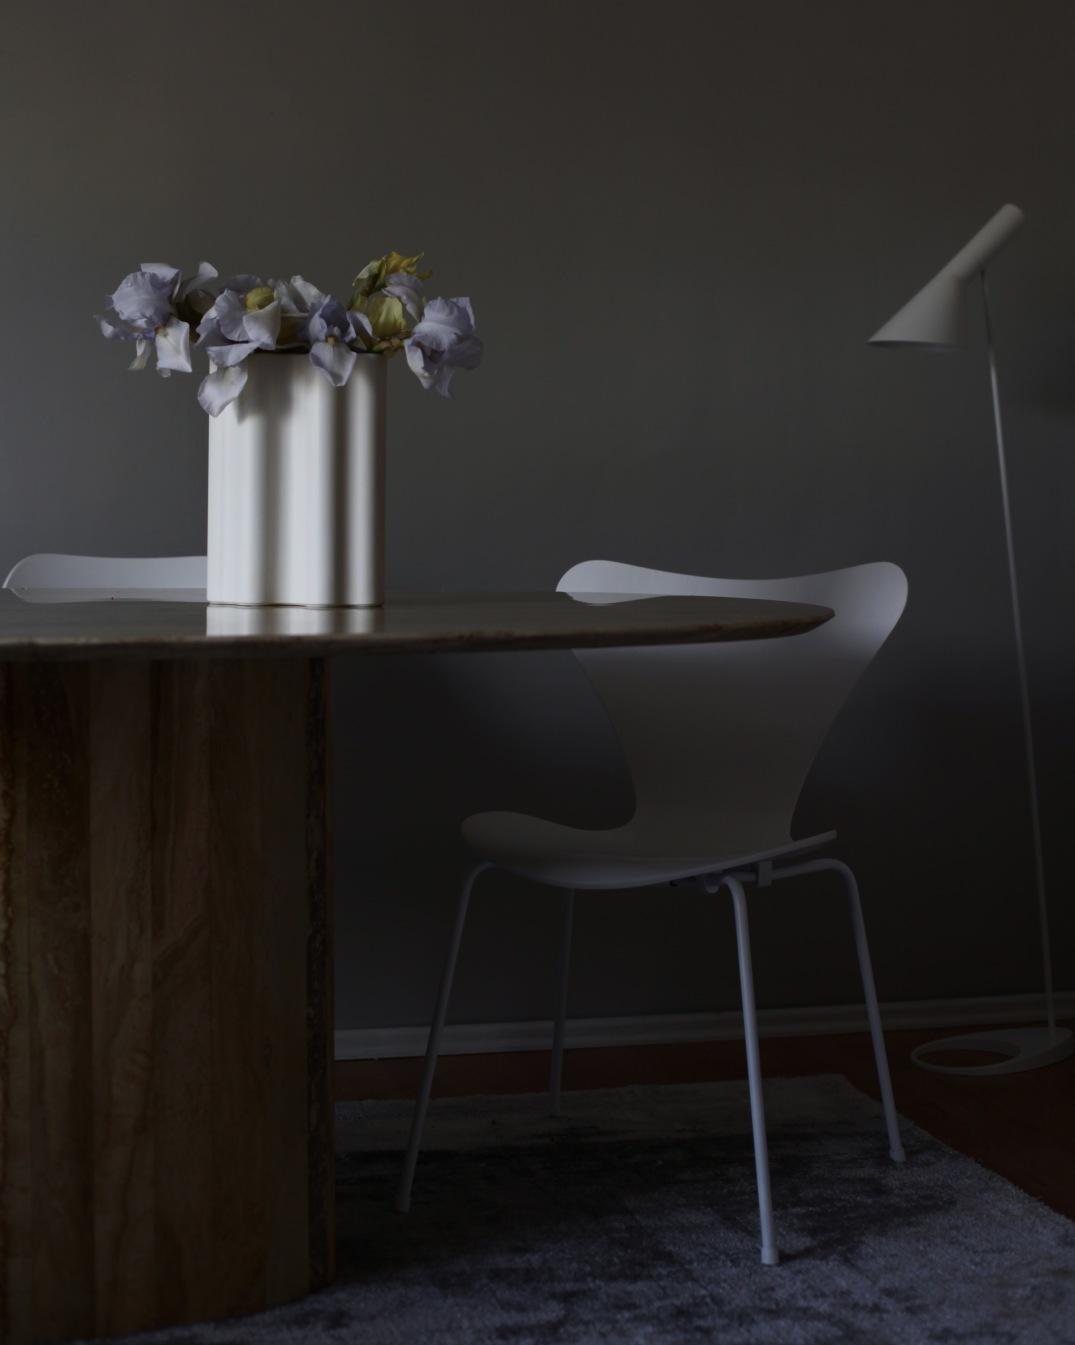 Arne Jacobsen, Fritz Hansen Series 7 monochrome, Louis Poulsen, Vitra, Marble Table